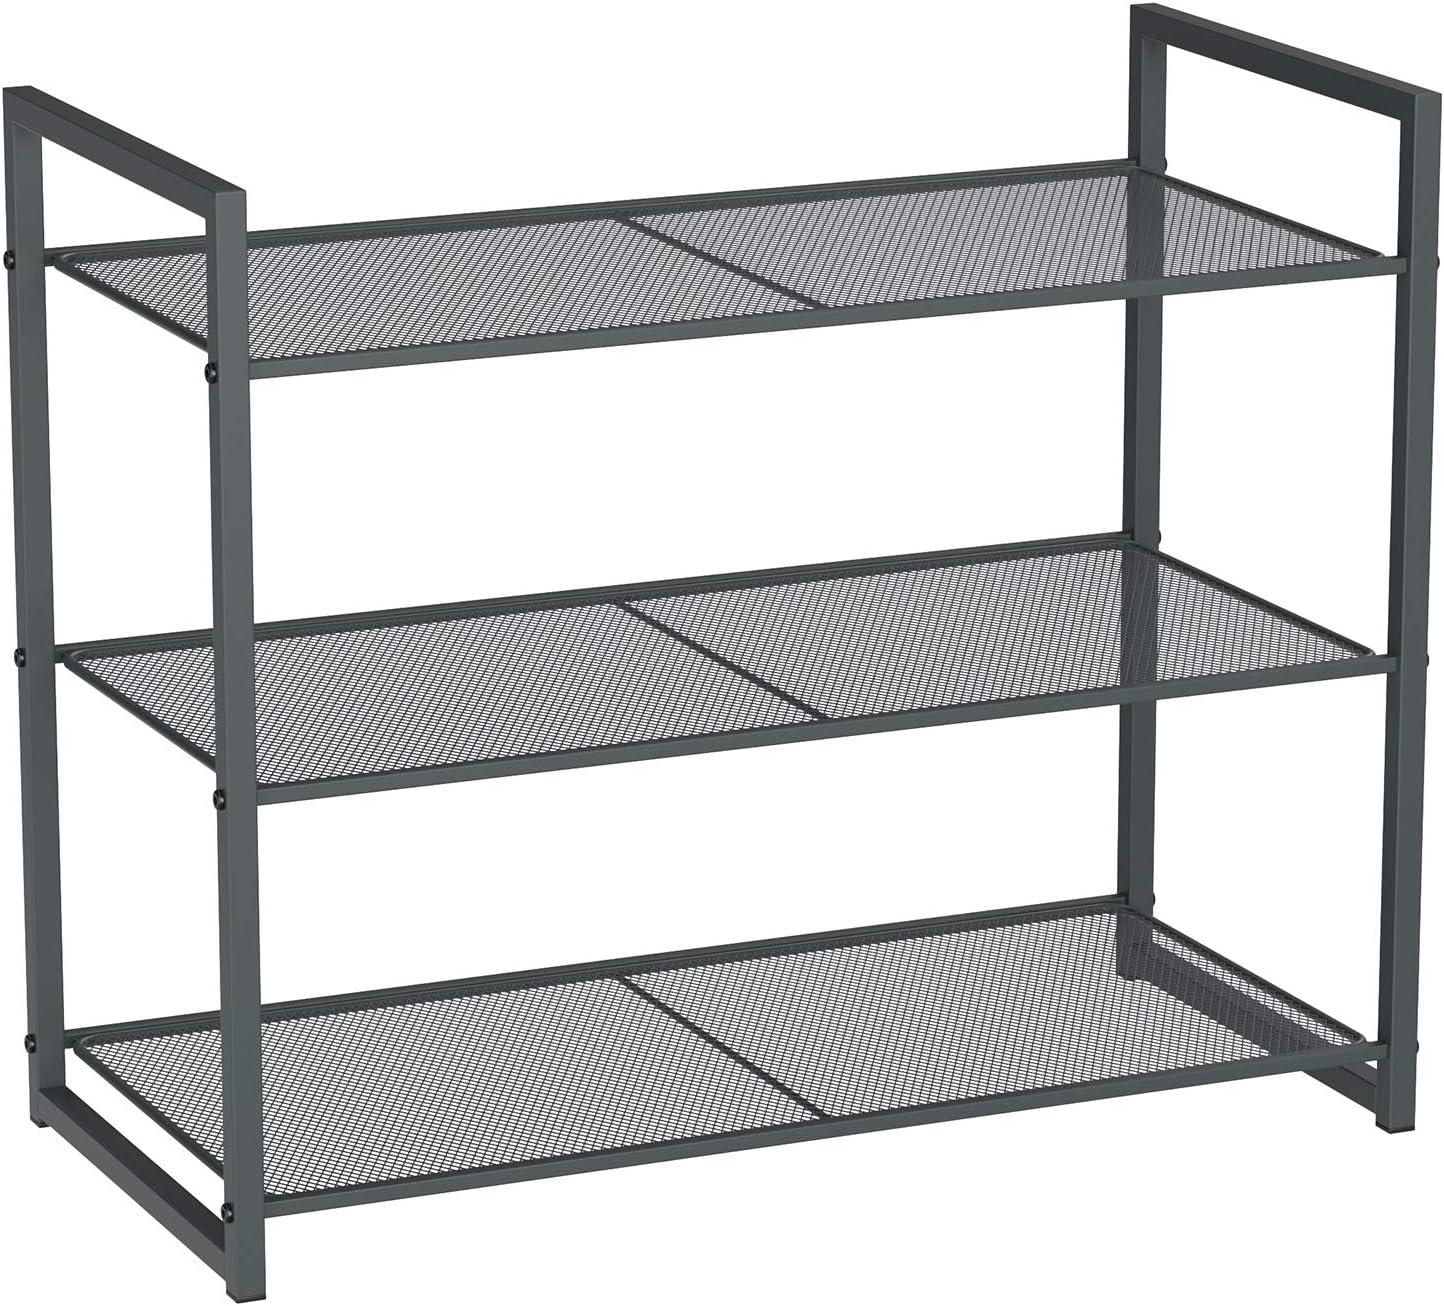 9-12 Pairs of Shoes 24.8 x 11.8 x 20.5 Inches SONGMICS 3-Tier Shoe Rack Metal Shoe Rack Storage Stackable Shoe Organizer Smoky Gray ULMR83GC